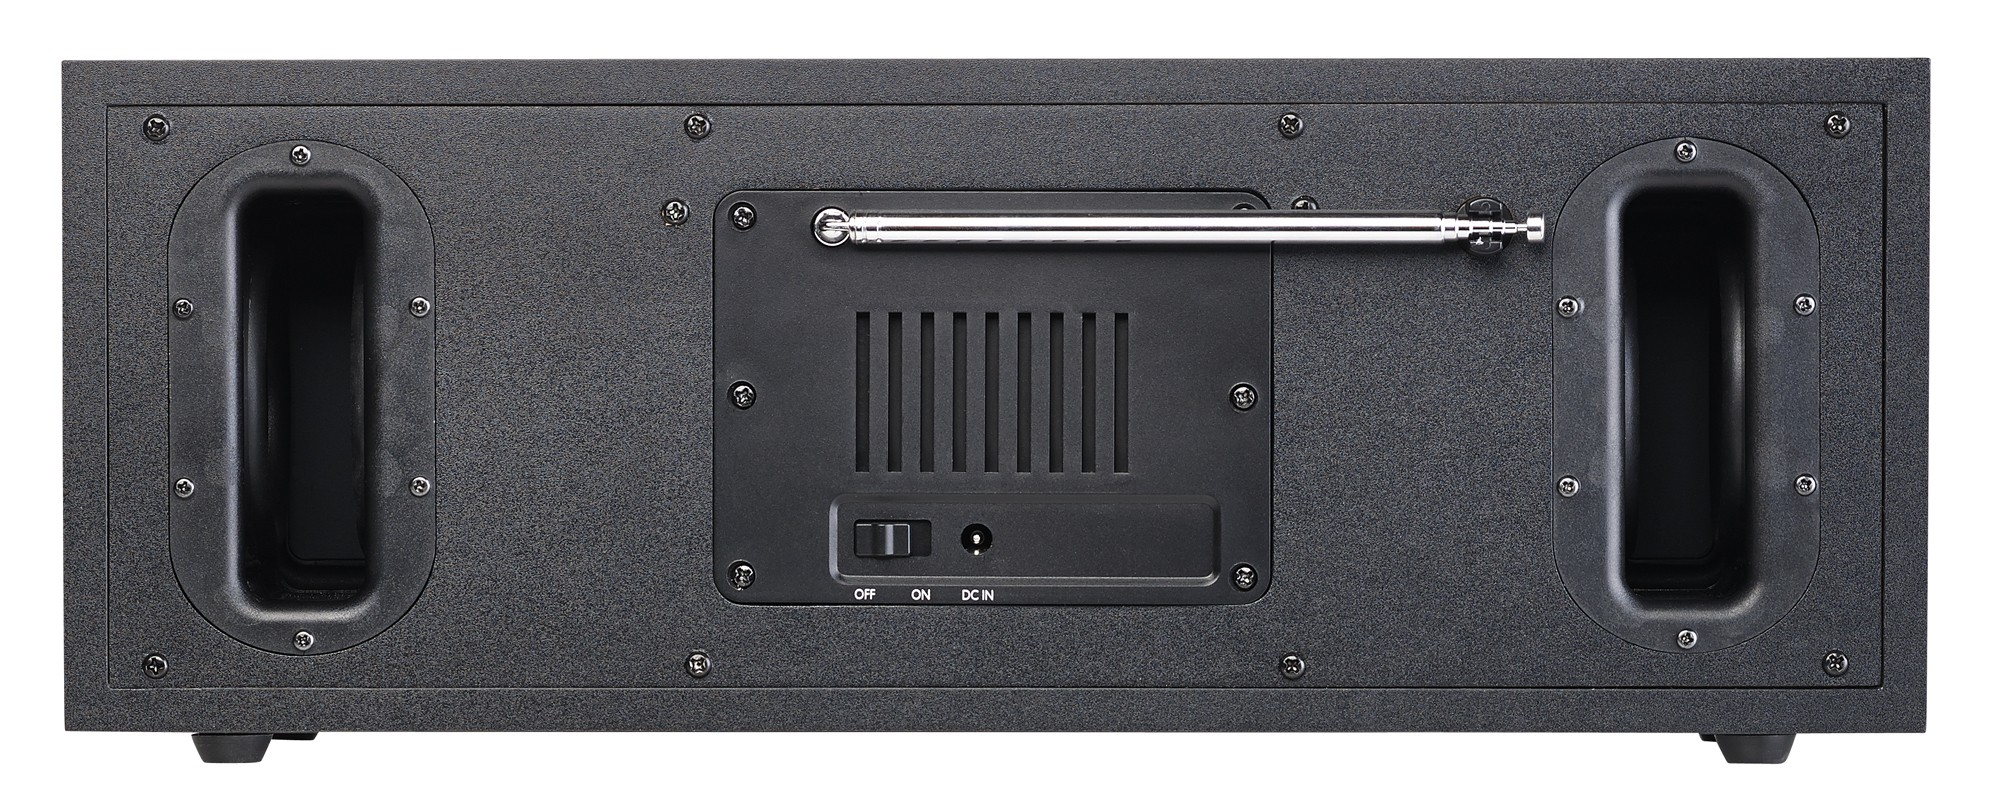 Stereo-Internetradio M. CD-Player, DAB+/FM, Farbdisplay